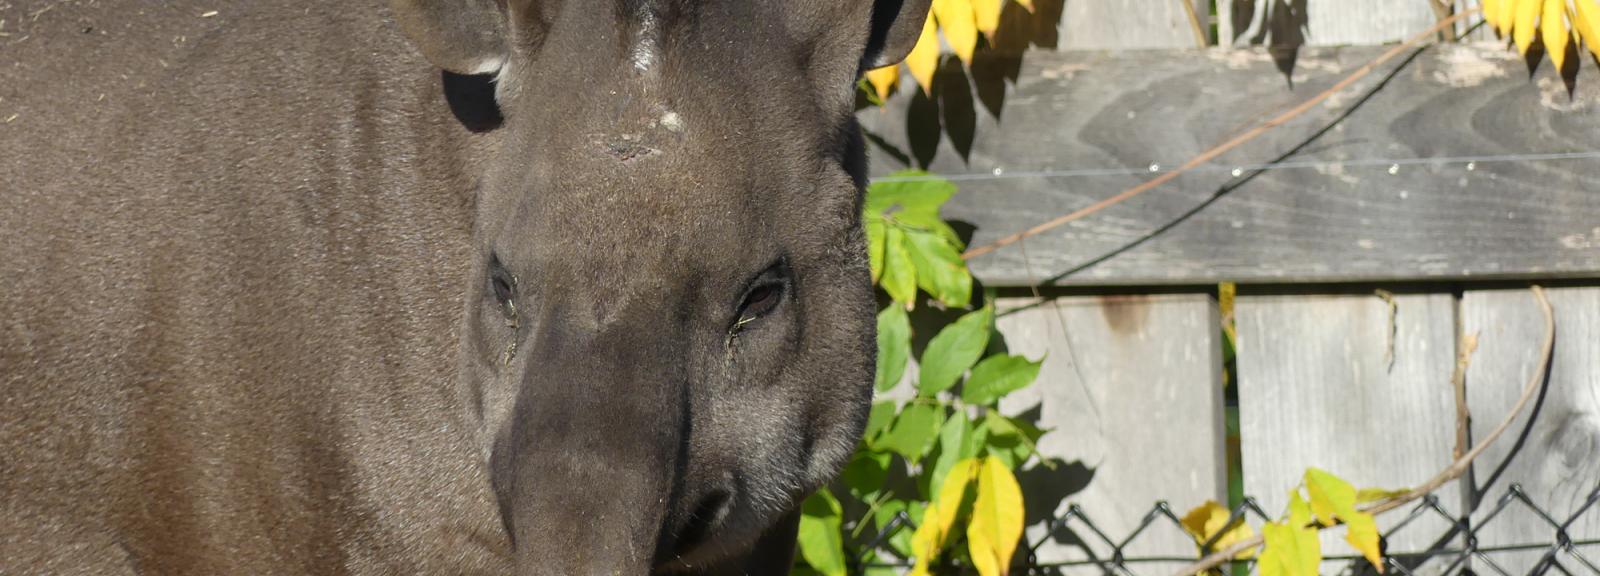 Eywa, femelle tapir